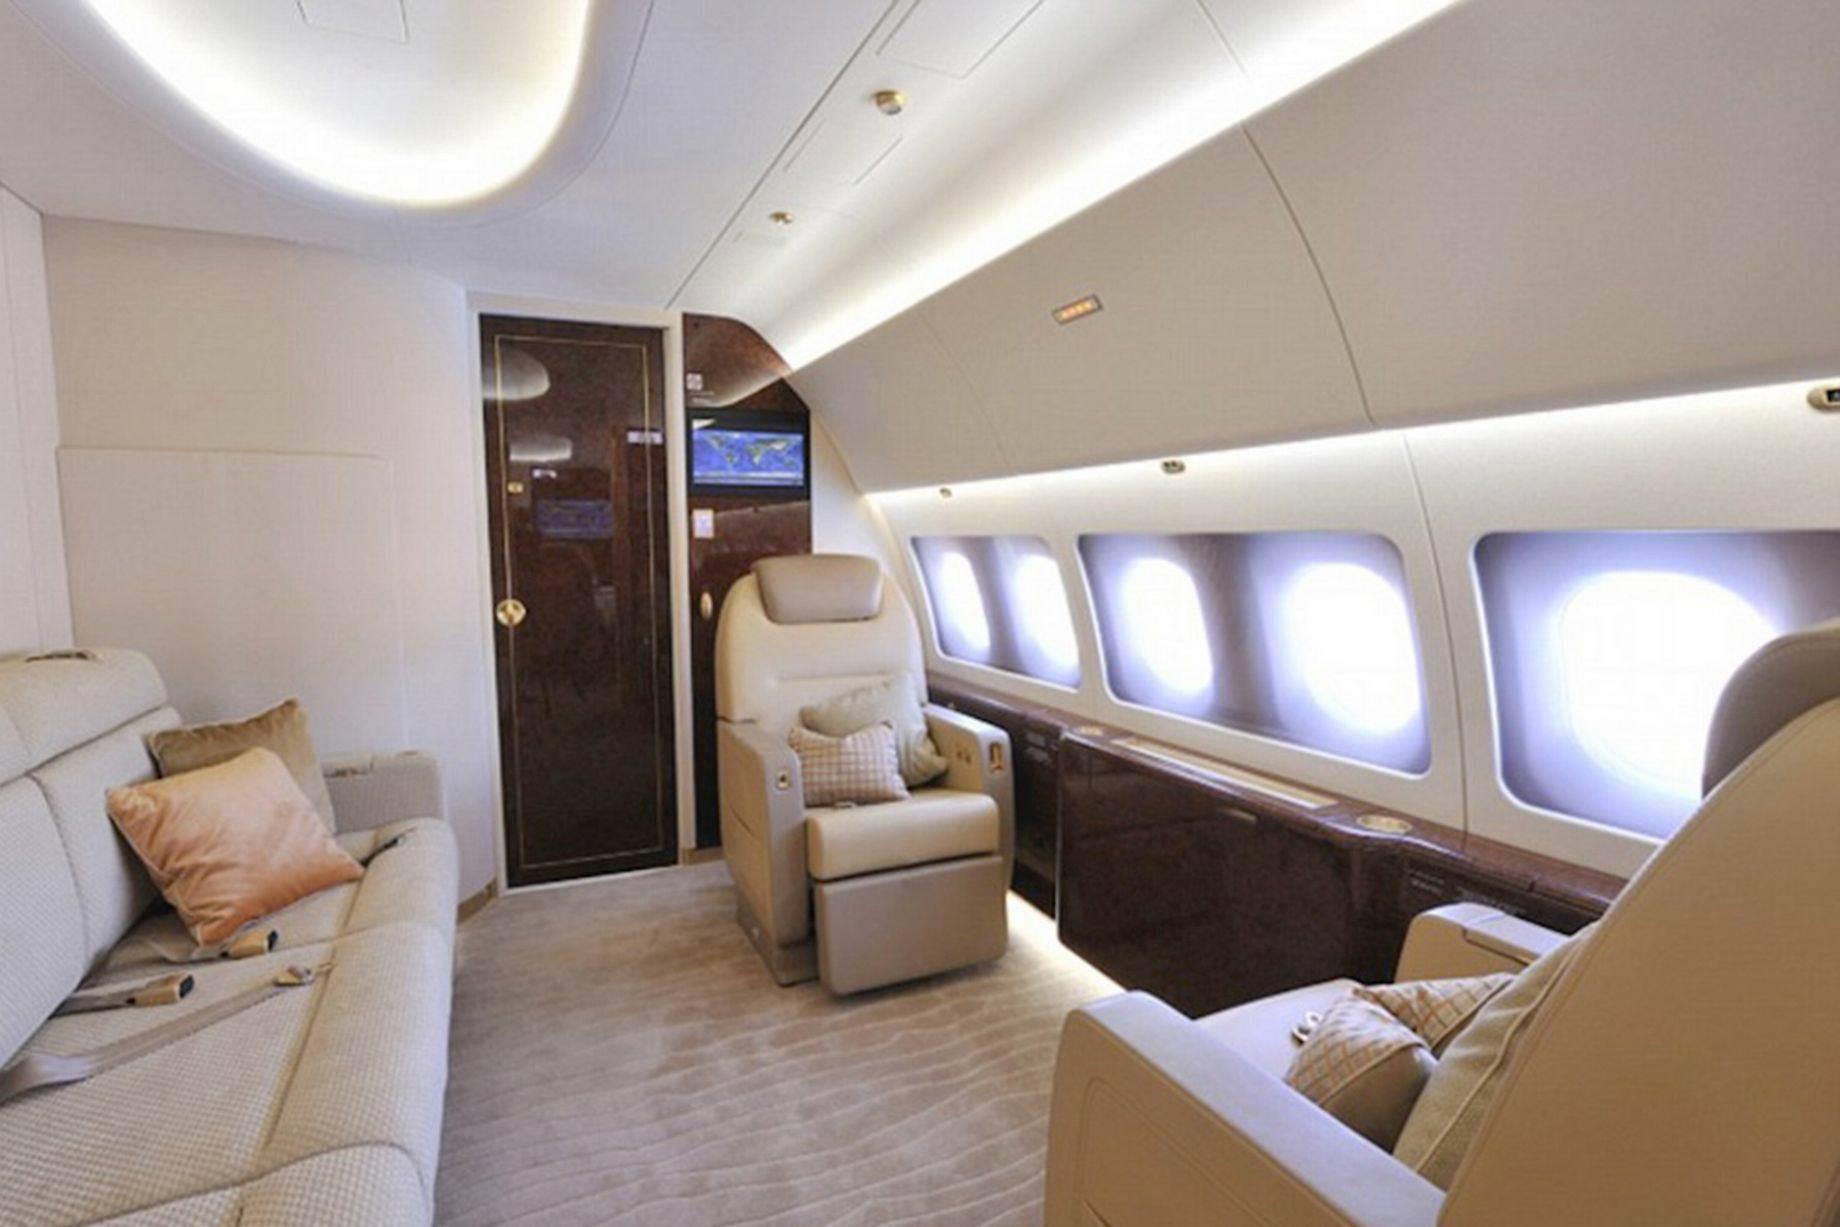 Prince-Charles-private67676767-jet